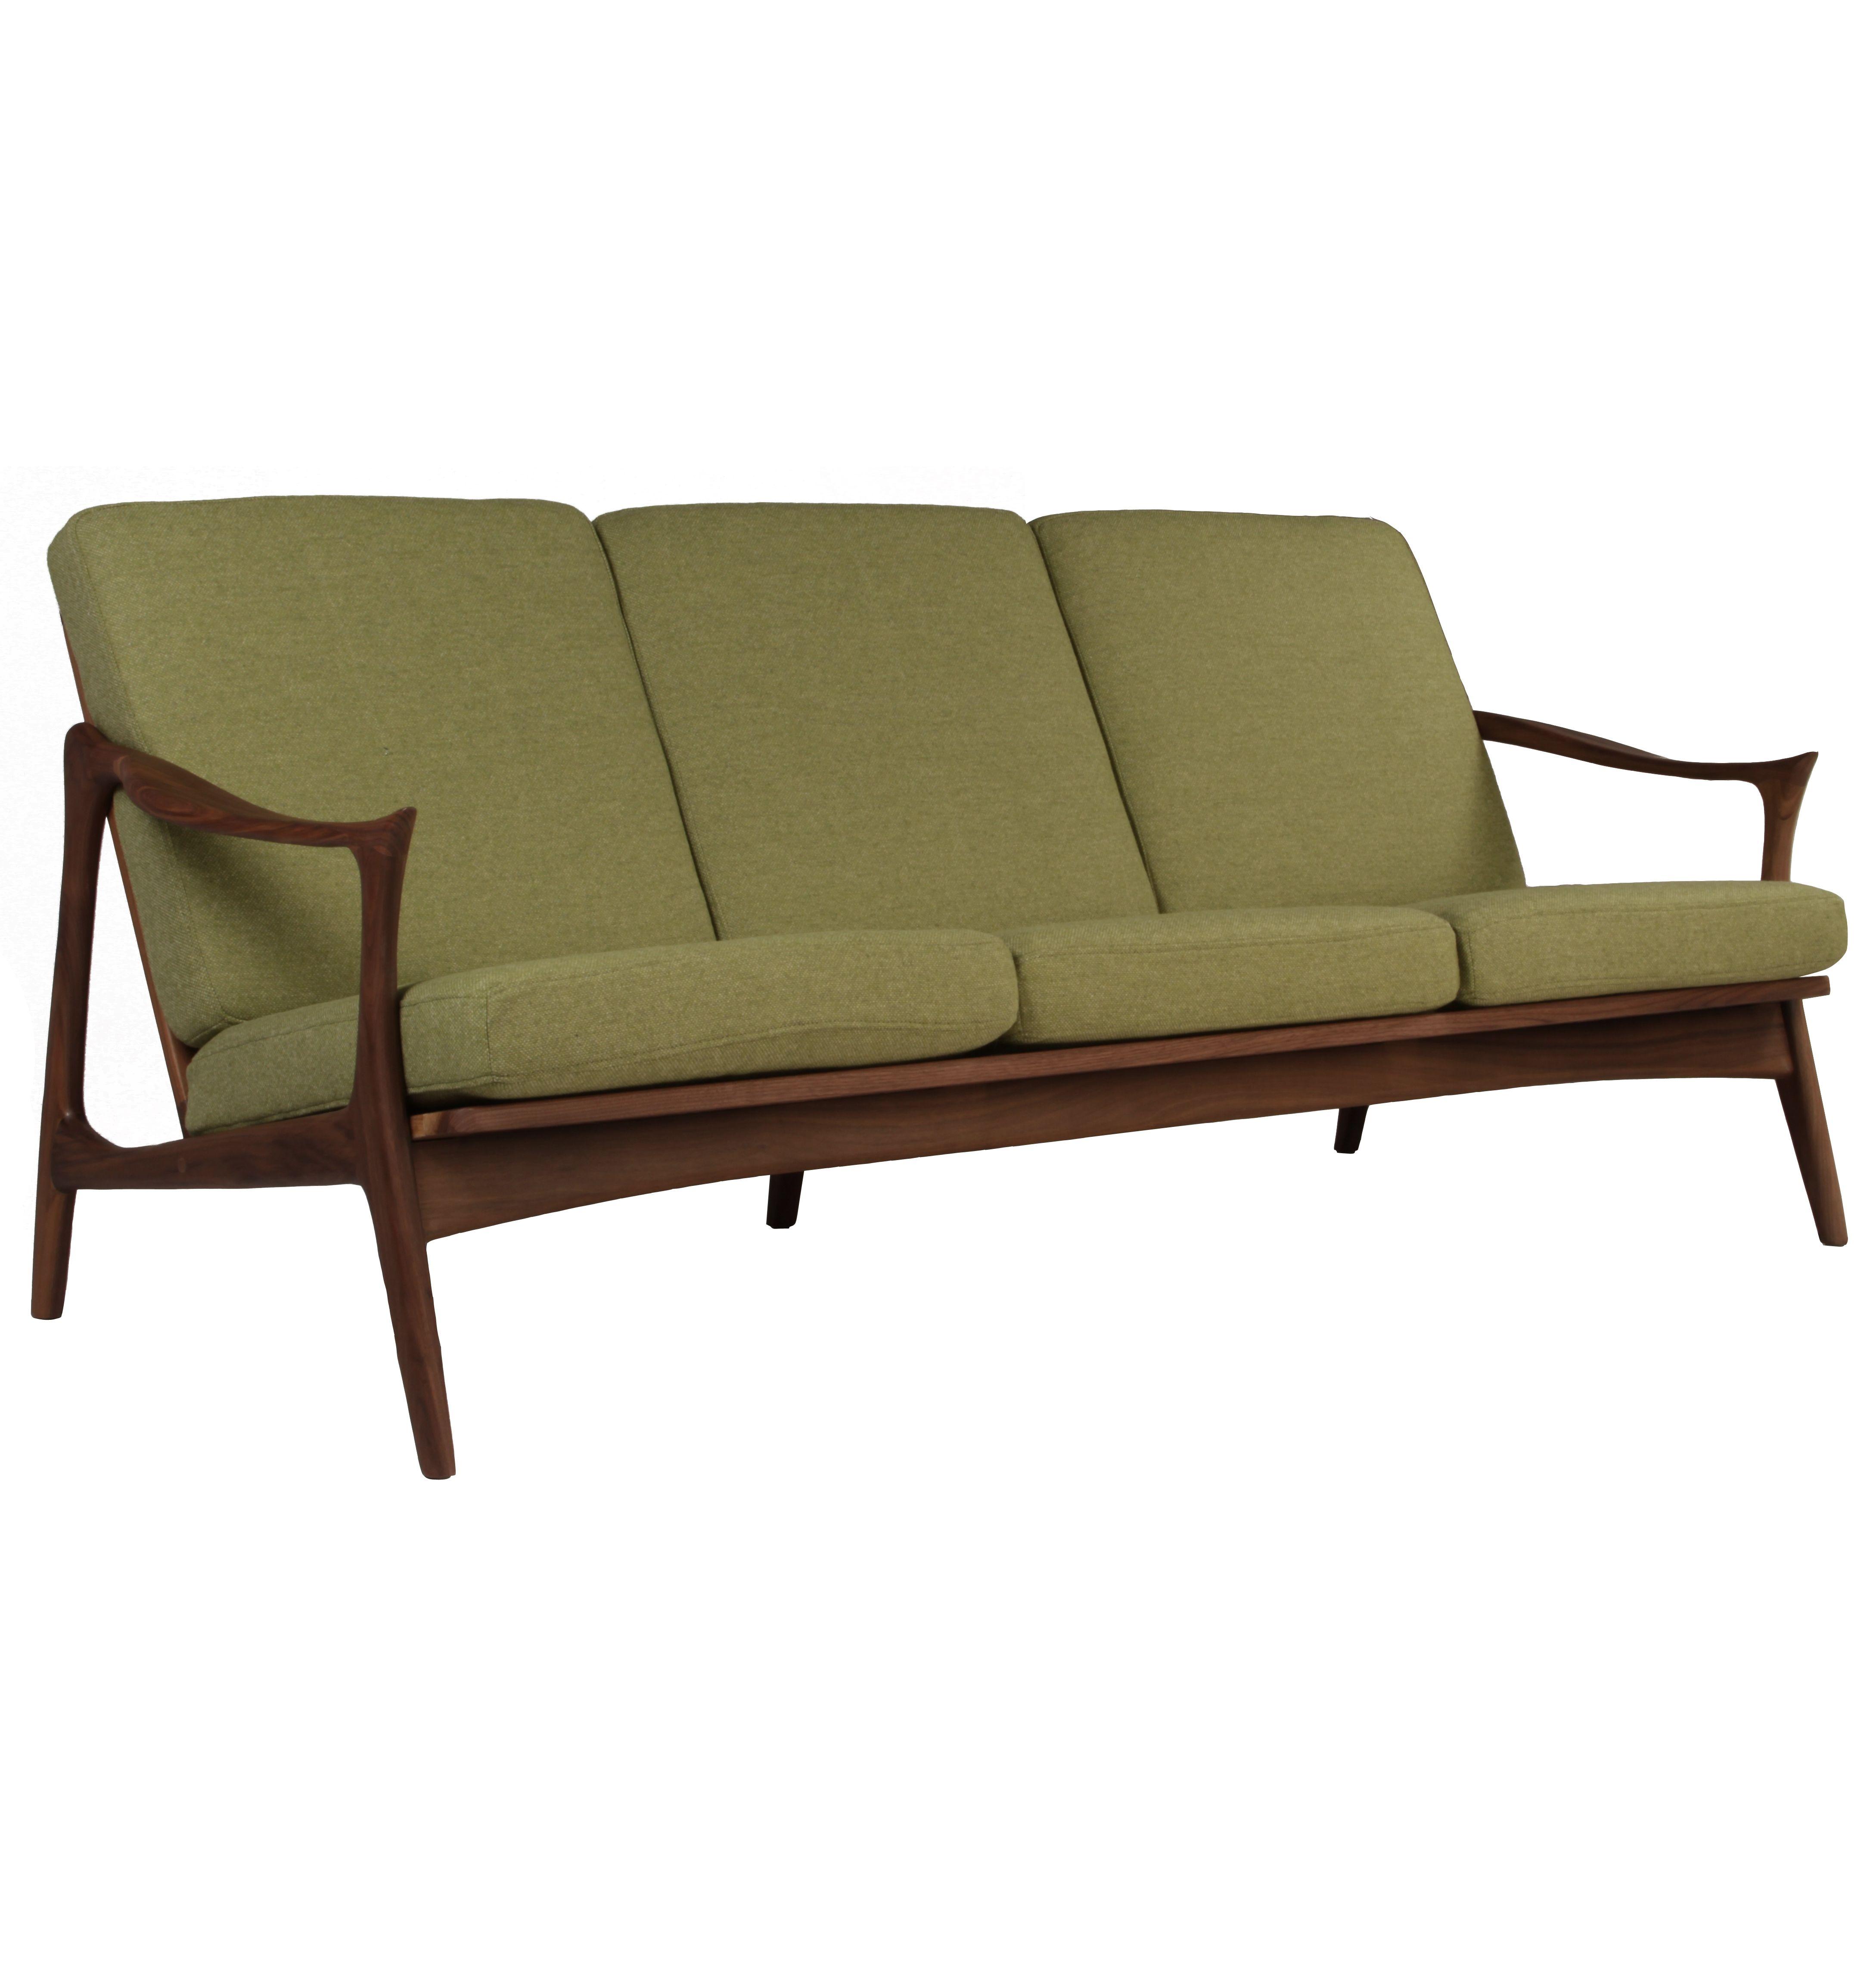 replica fredrik kayser home pinterest. Black Bedroom Furniture Sets. Home Design Ideas